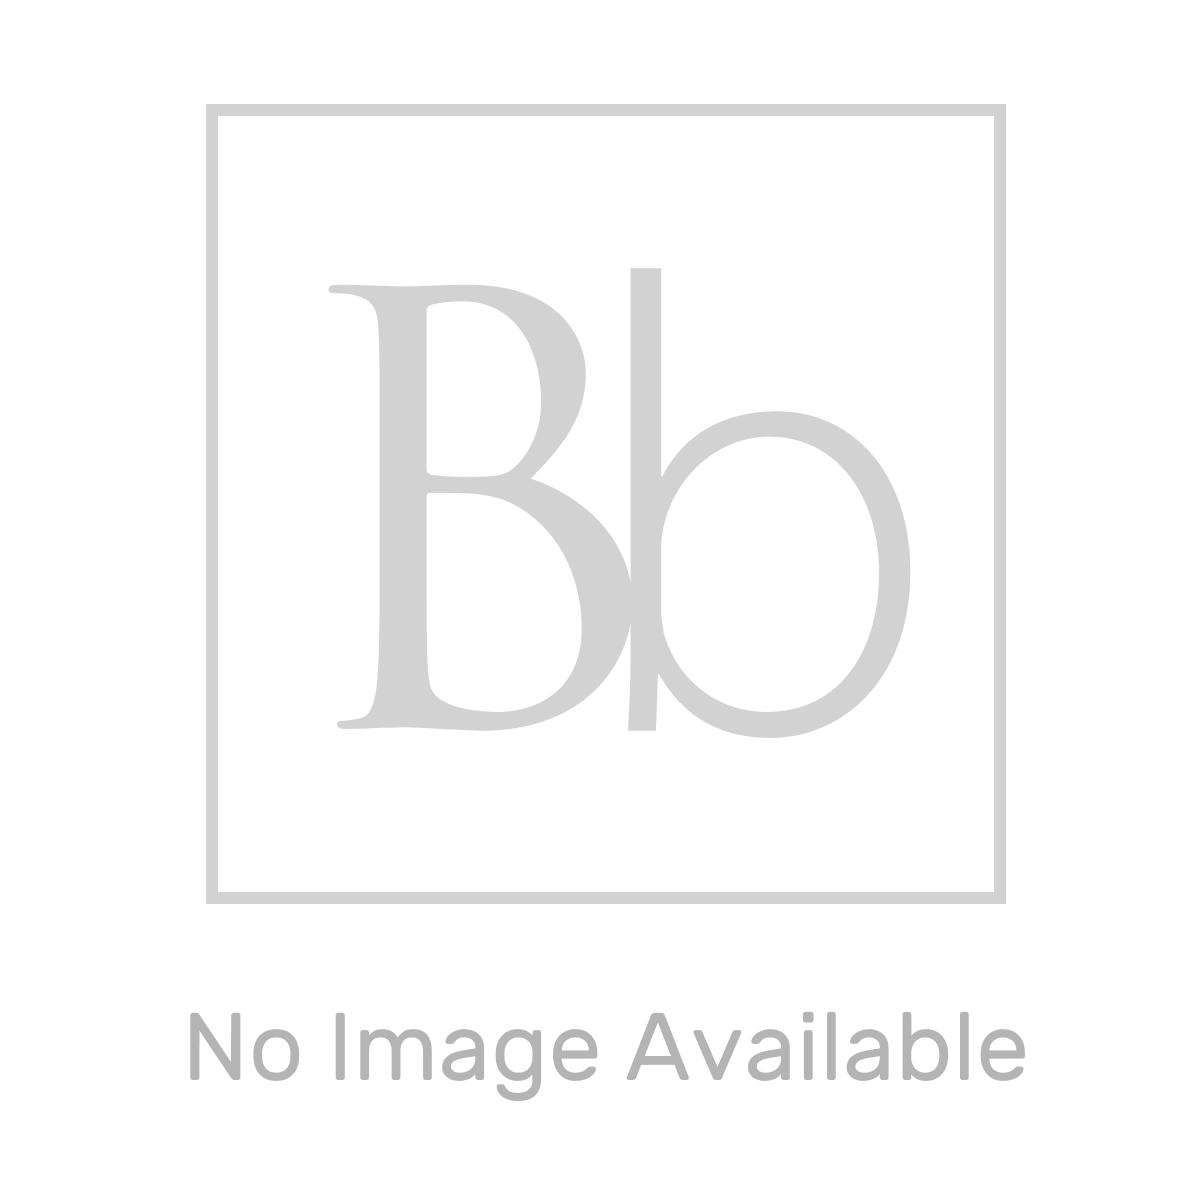 Kartell Astley Matt White Front Bath Panel 1800mm Lifestyle